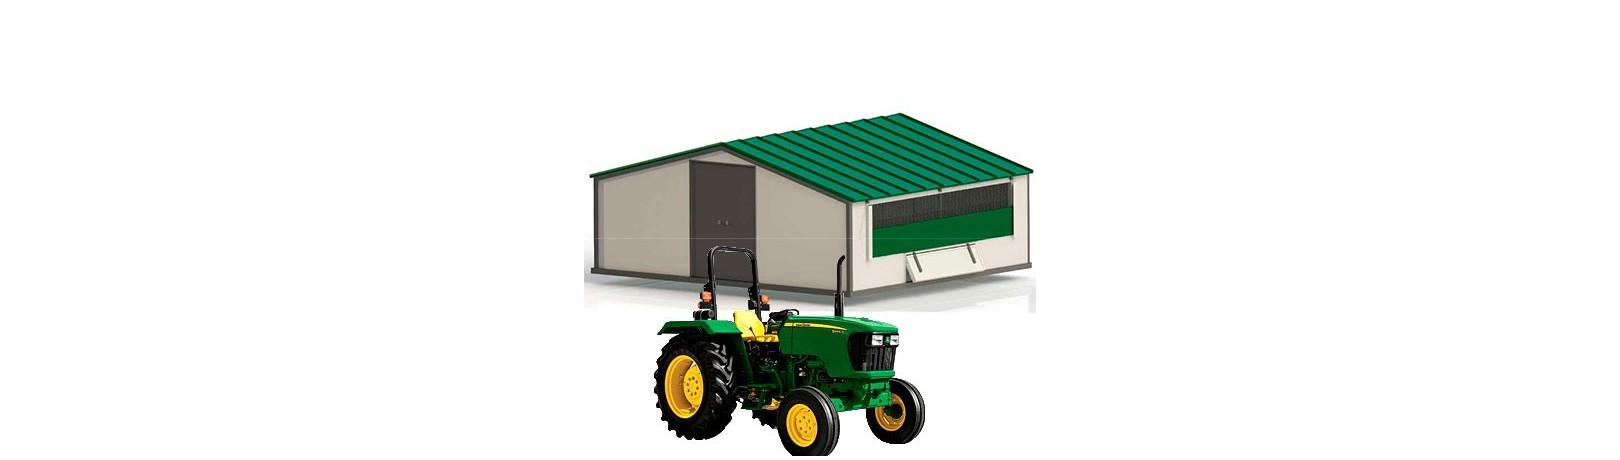 Mobile Farmyards